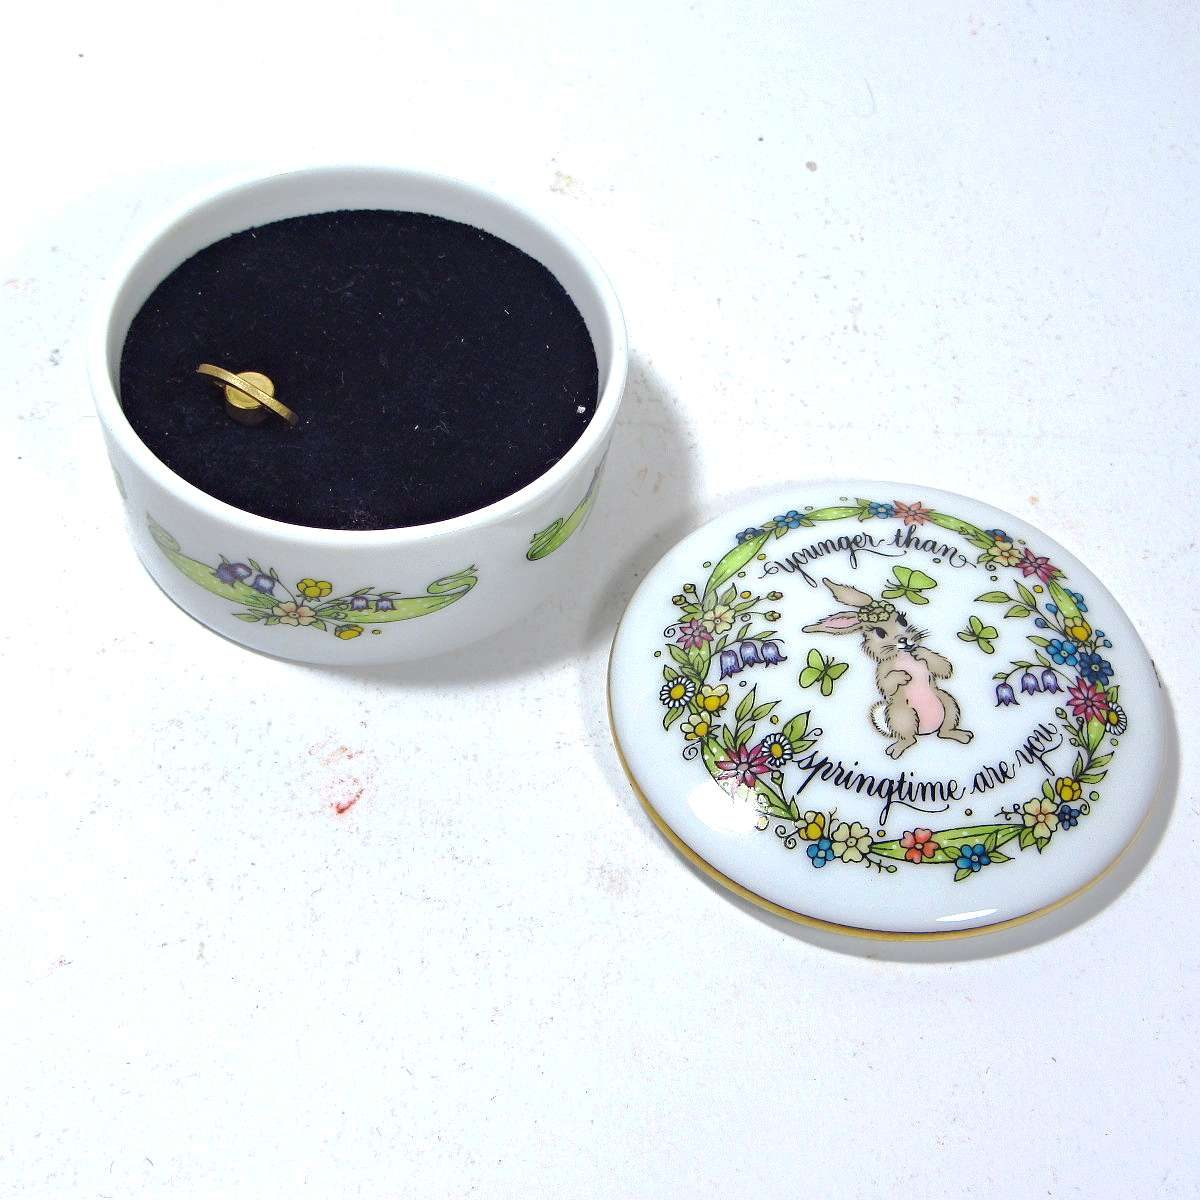 Porselen Laterna Kutu Mekanik-Elektrikli Objeler Düğün